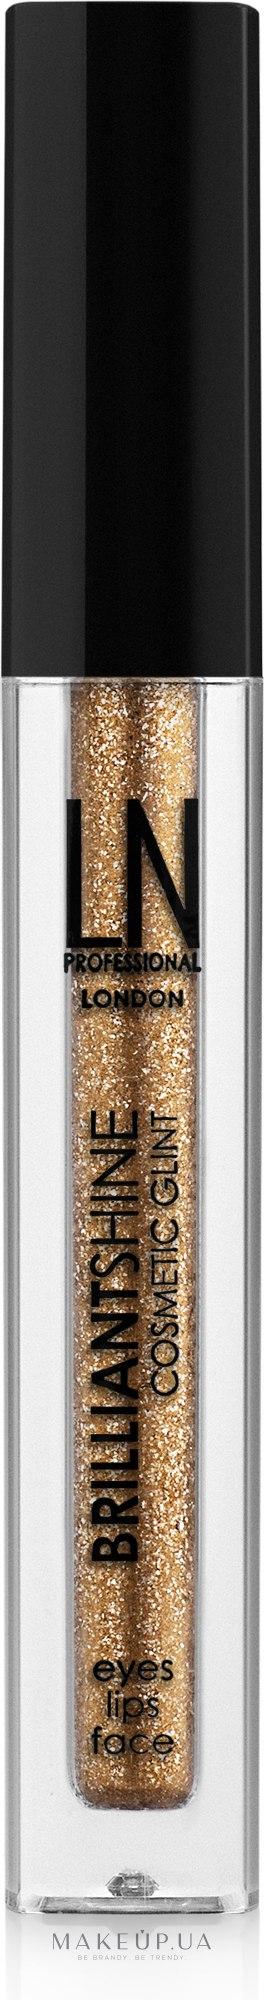 Жидкий глиттер для макияжа - LN Professional Brilliantshine Cosmetic Glint — фото 01 - Precious Amber